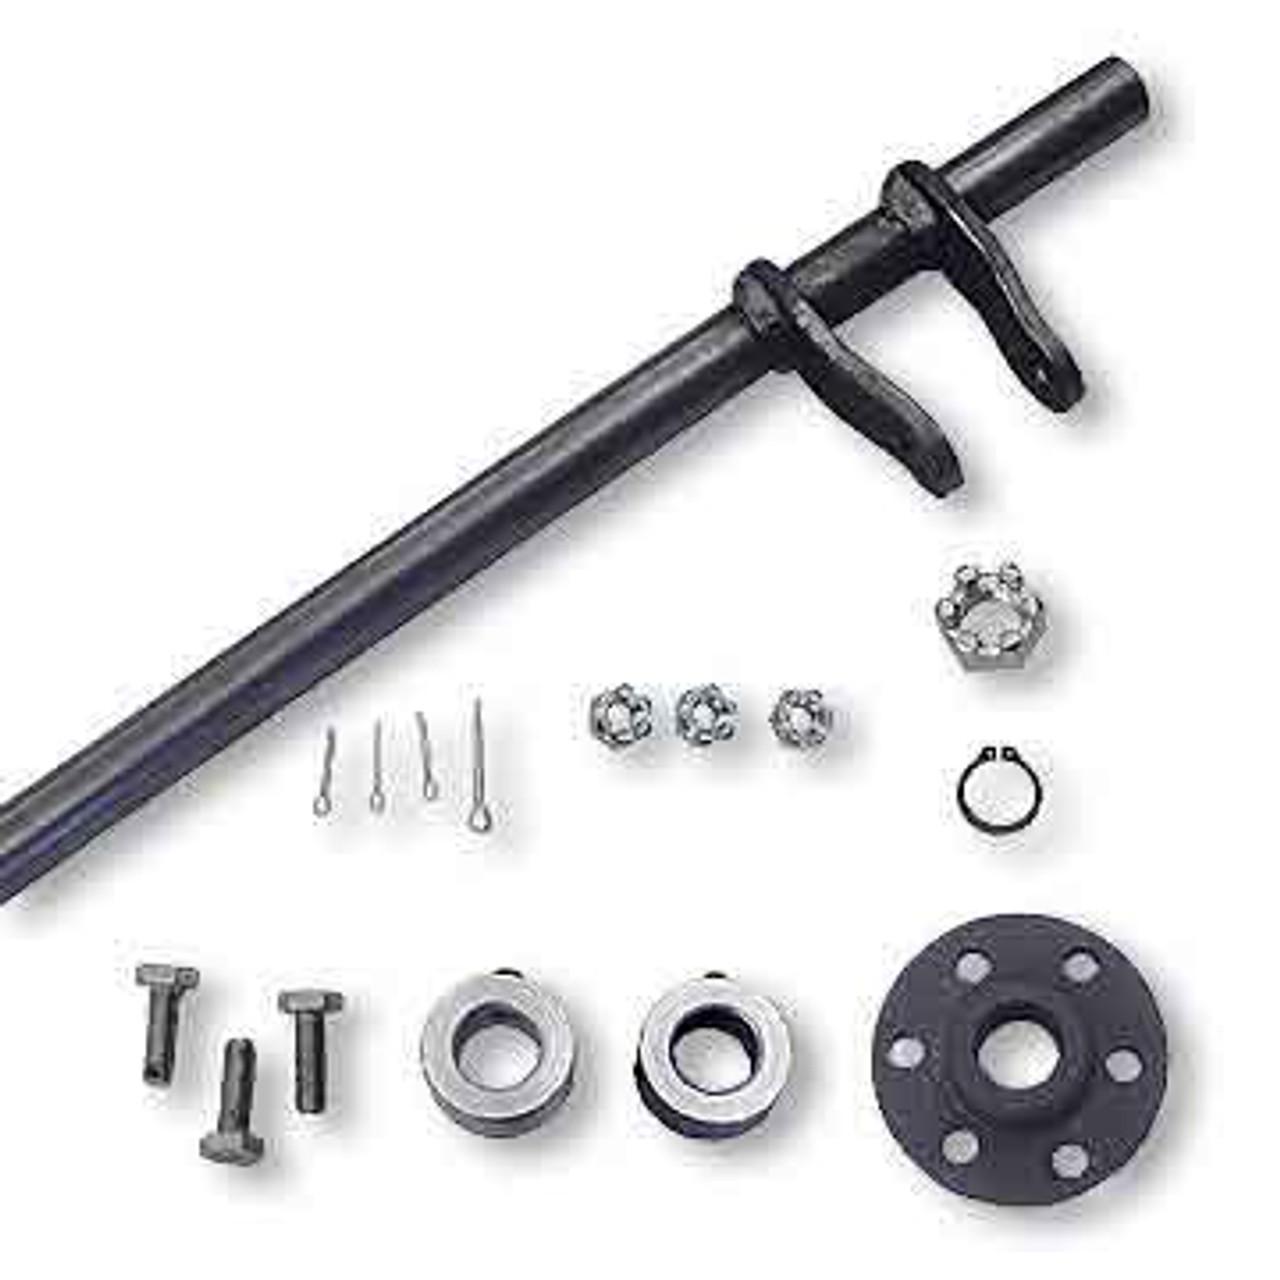 "Steering Shaft, 5/8"" OD & Hub Kit, Welded Pitman Arms, 28"" Length"